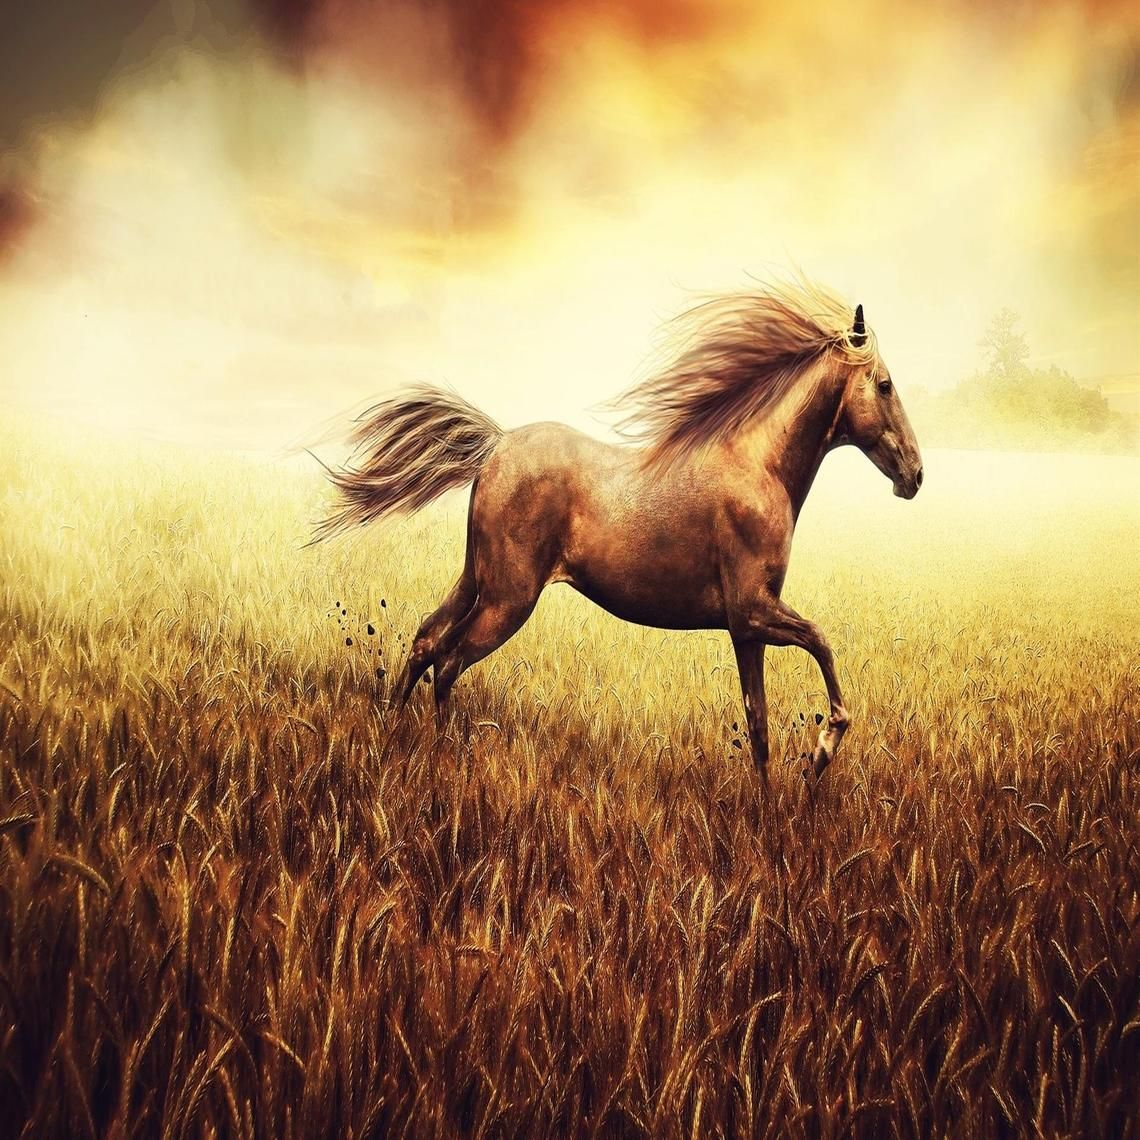 Download Wallpaper Horse Summer - f712955f9c89289c495bc68cfc608845  You Should Have_151130.jpg